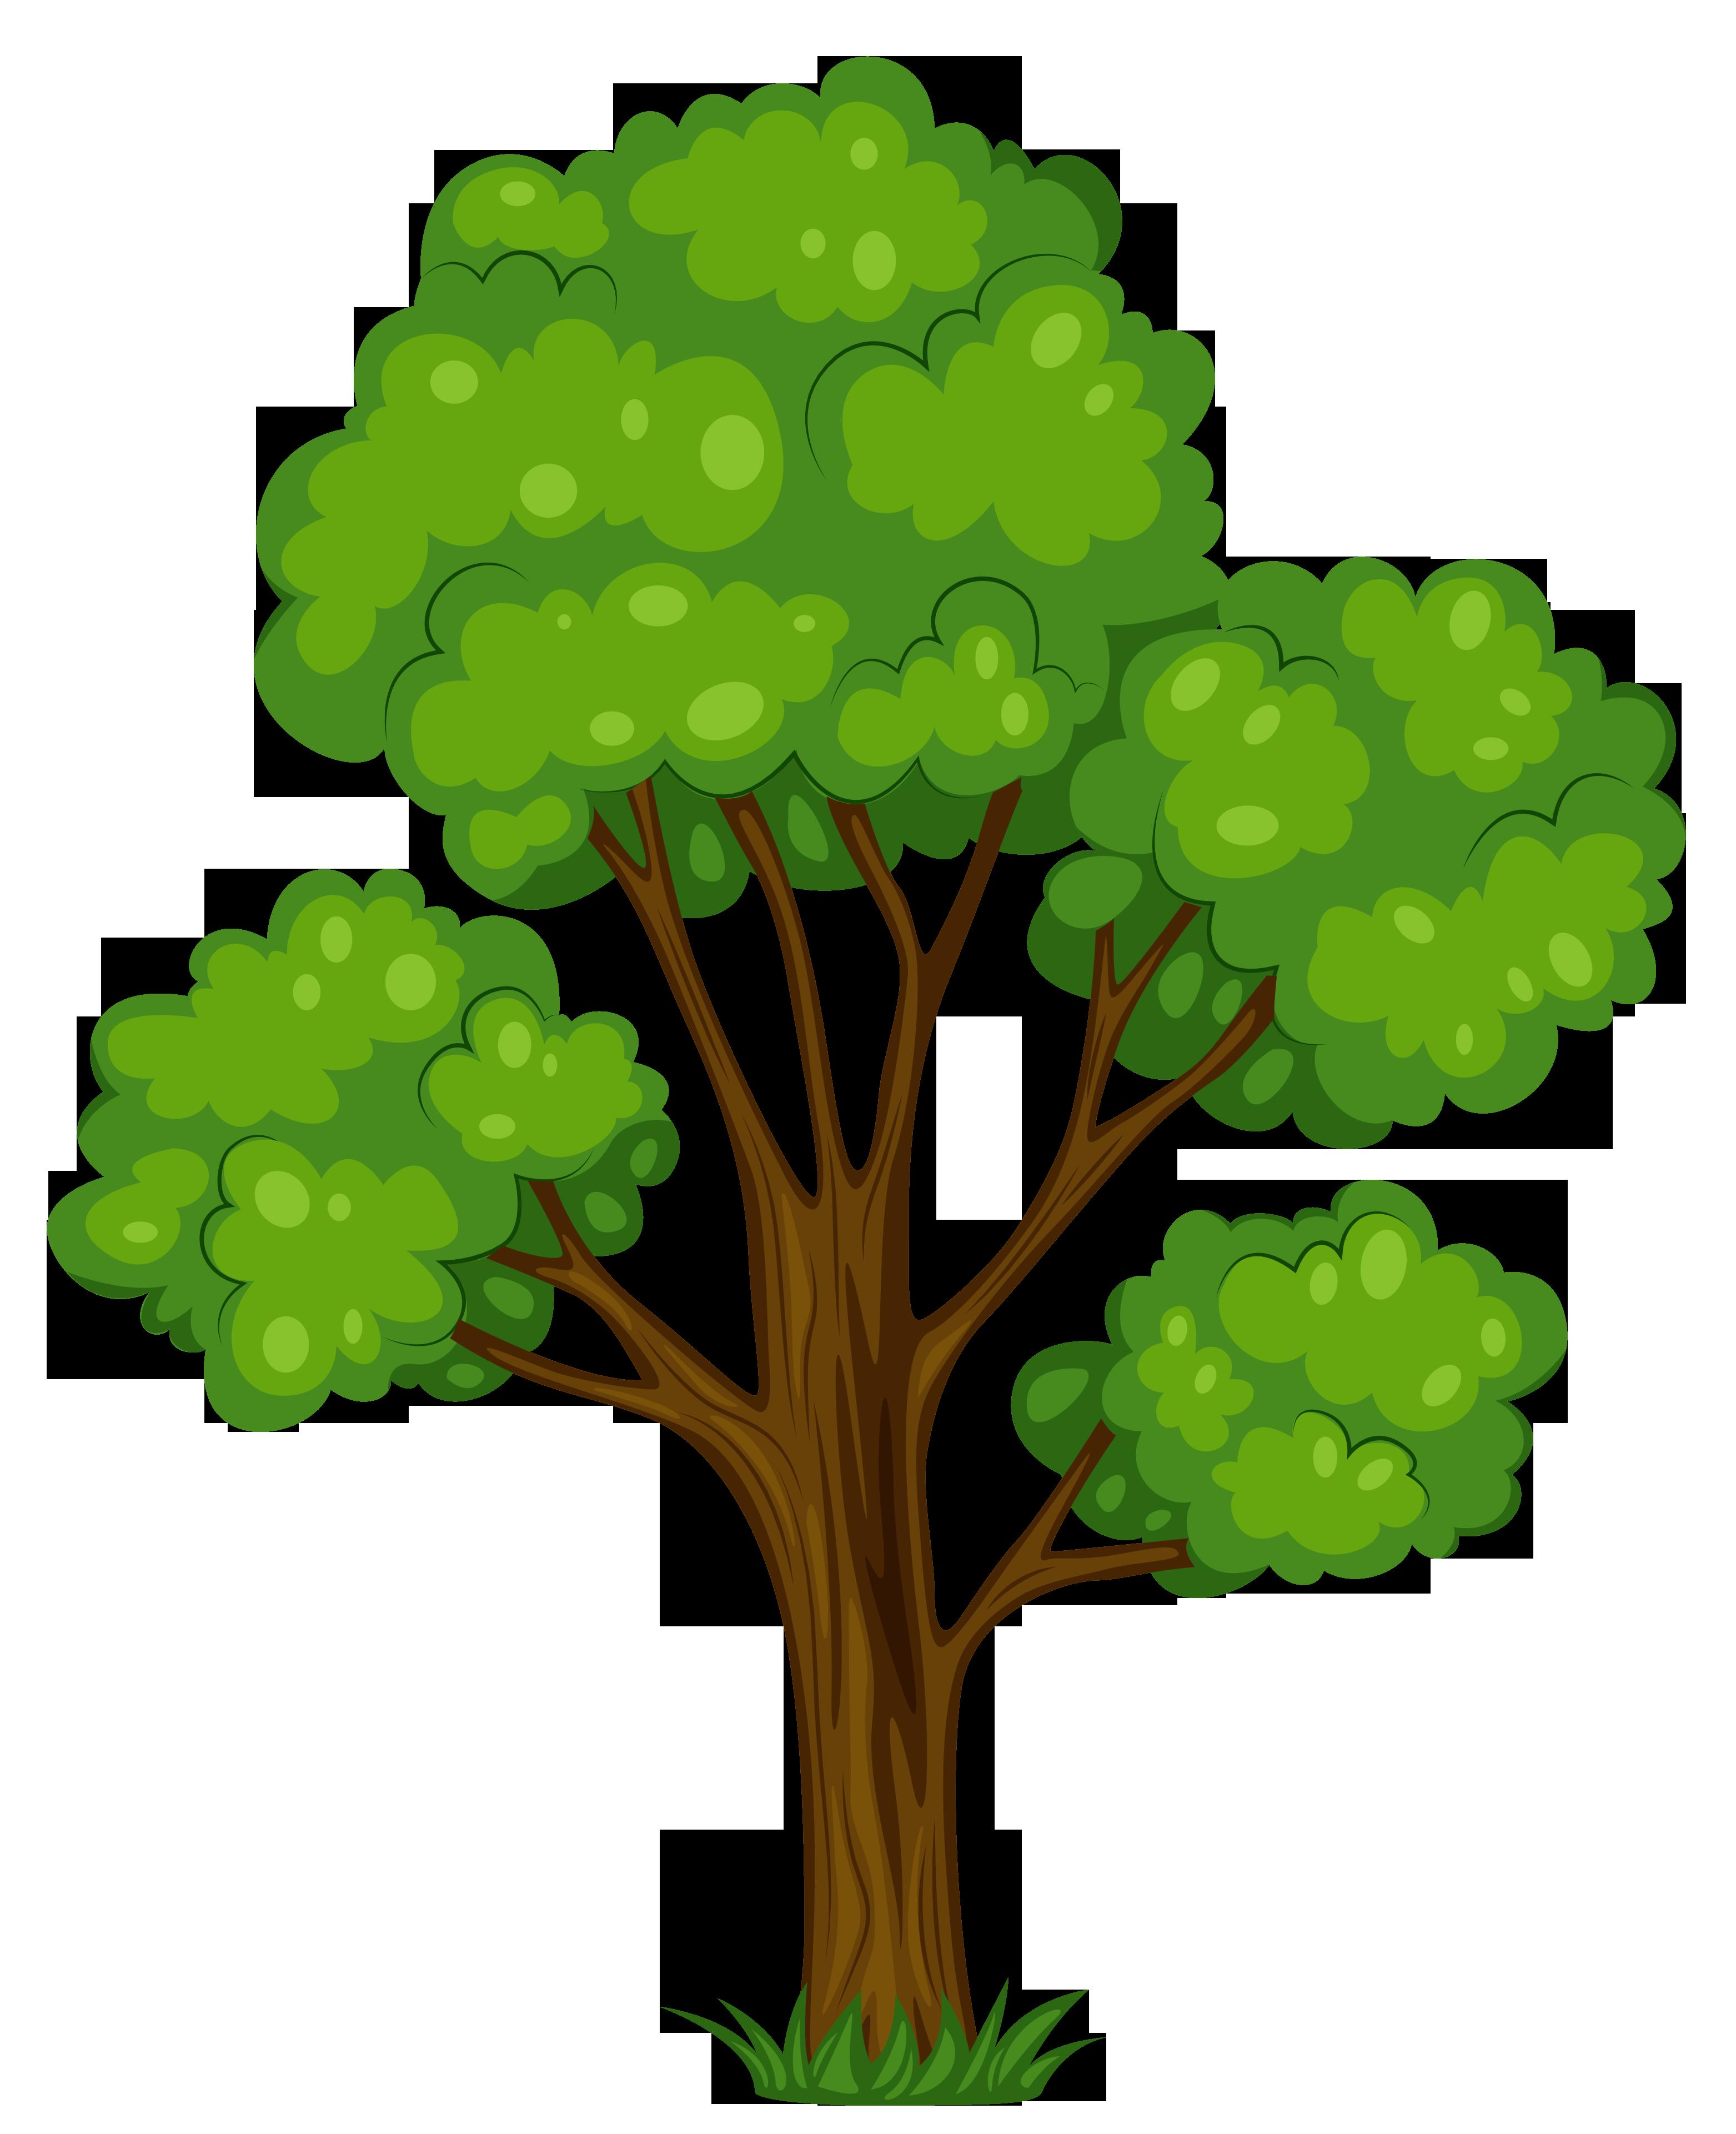 Tree Clip Art 7 - Tree Clipart PNG